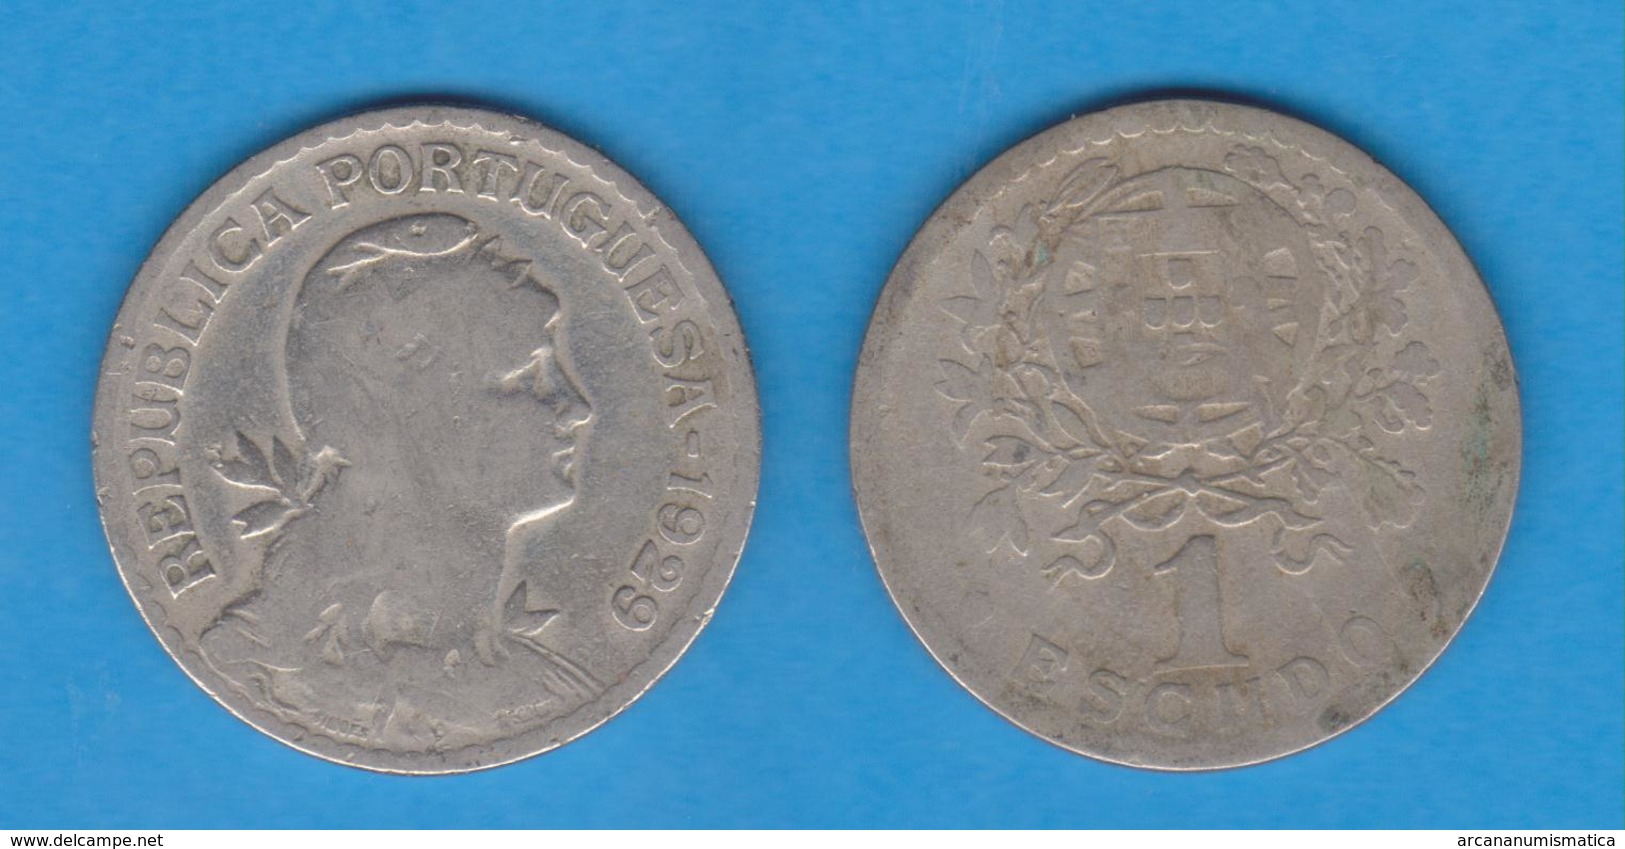 PORTUGAL  1 ESCUDO 1.929  Cu Ni/ALPACA  KM#578   BC/MBC  F/VF   T-DL-12.028 - Monedas & Billetes